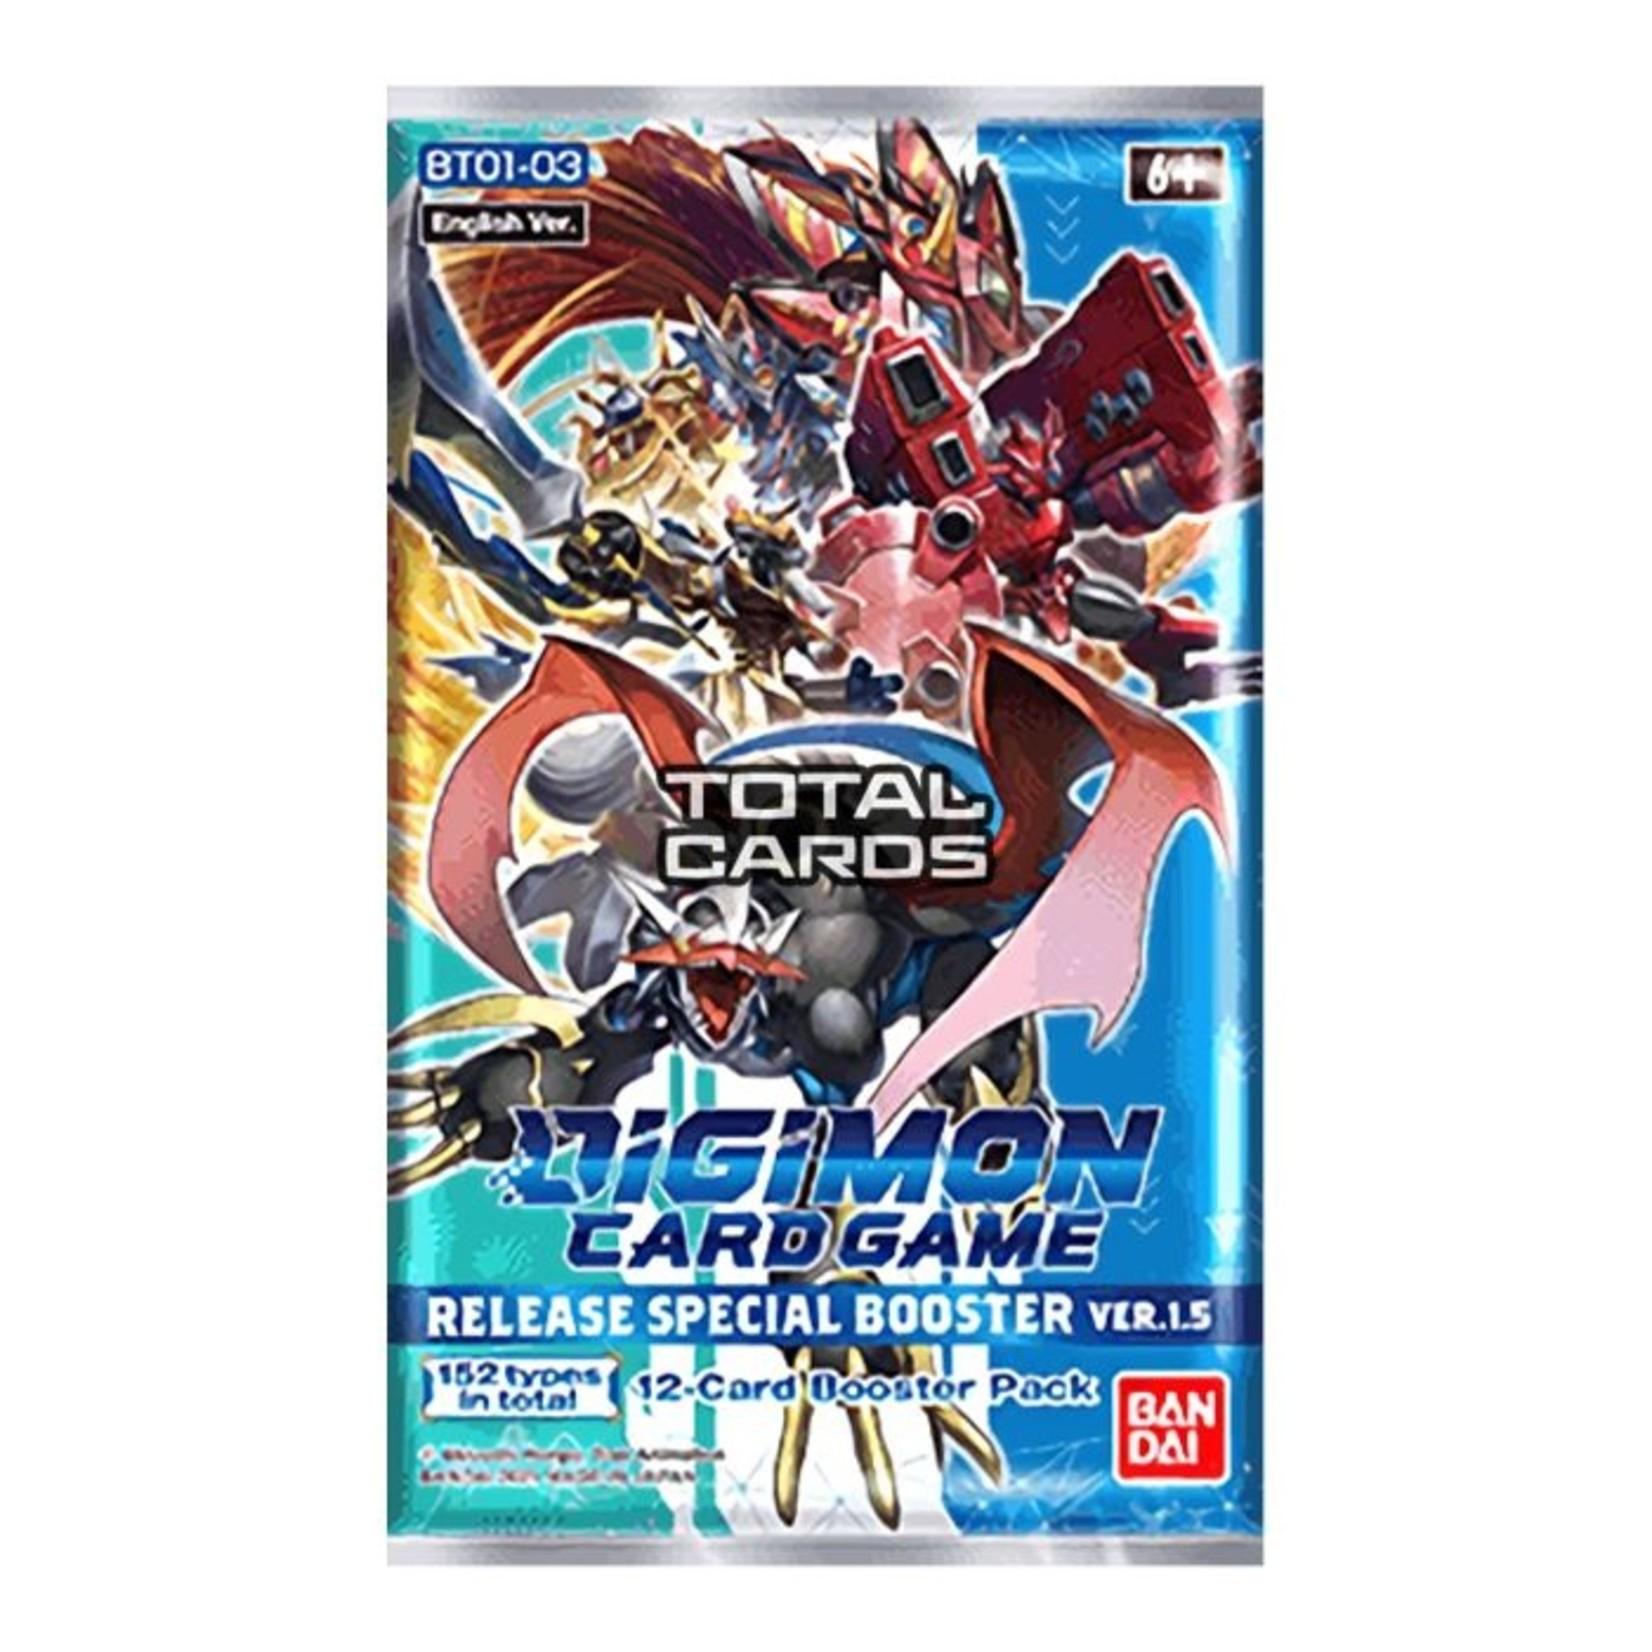 Bandai America, Inc. Digimon TGC: Release Special Booster Pack Ver. 1.5